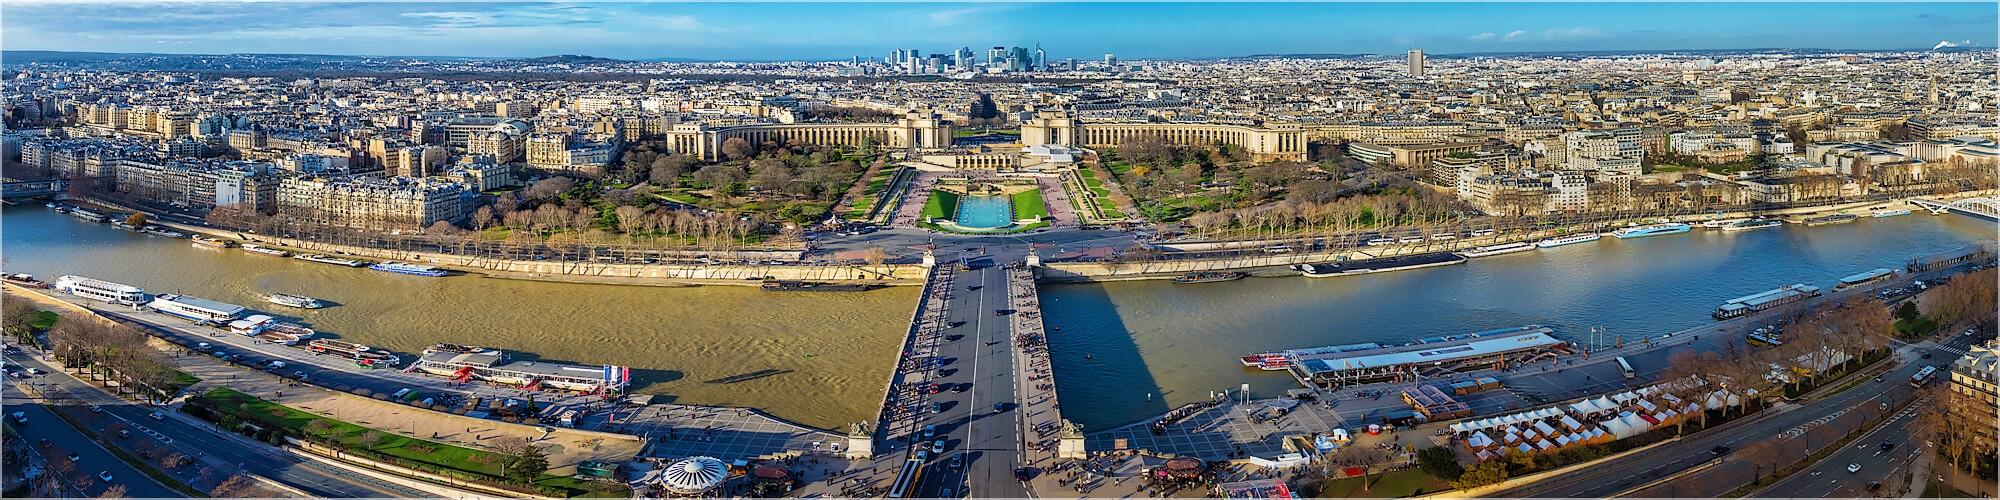 Panoramabild Paris Blick vom Eifelturm auf Trocadéro